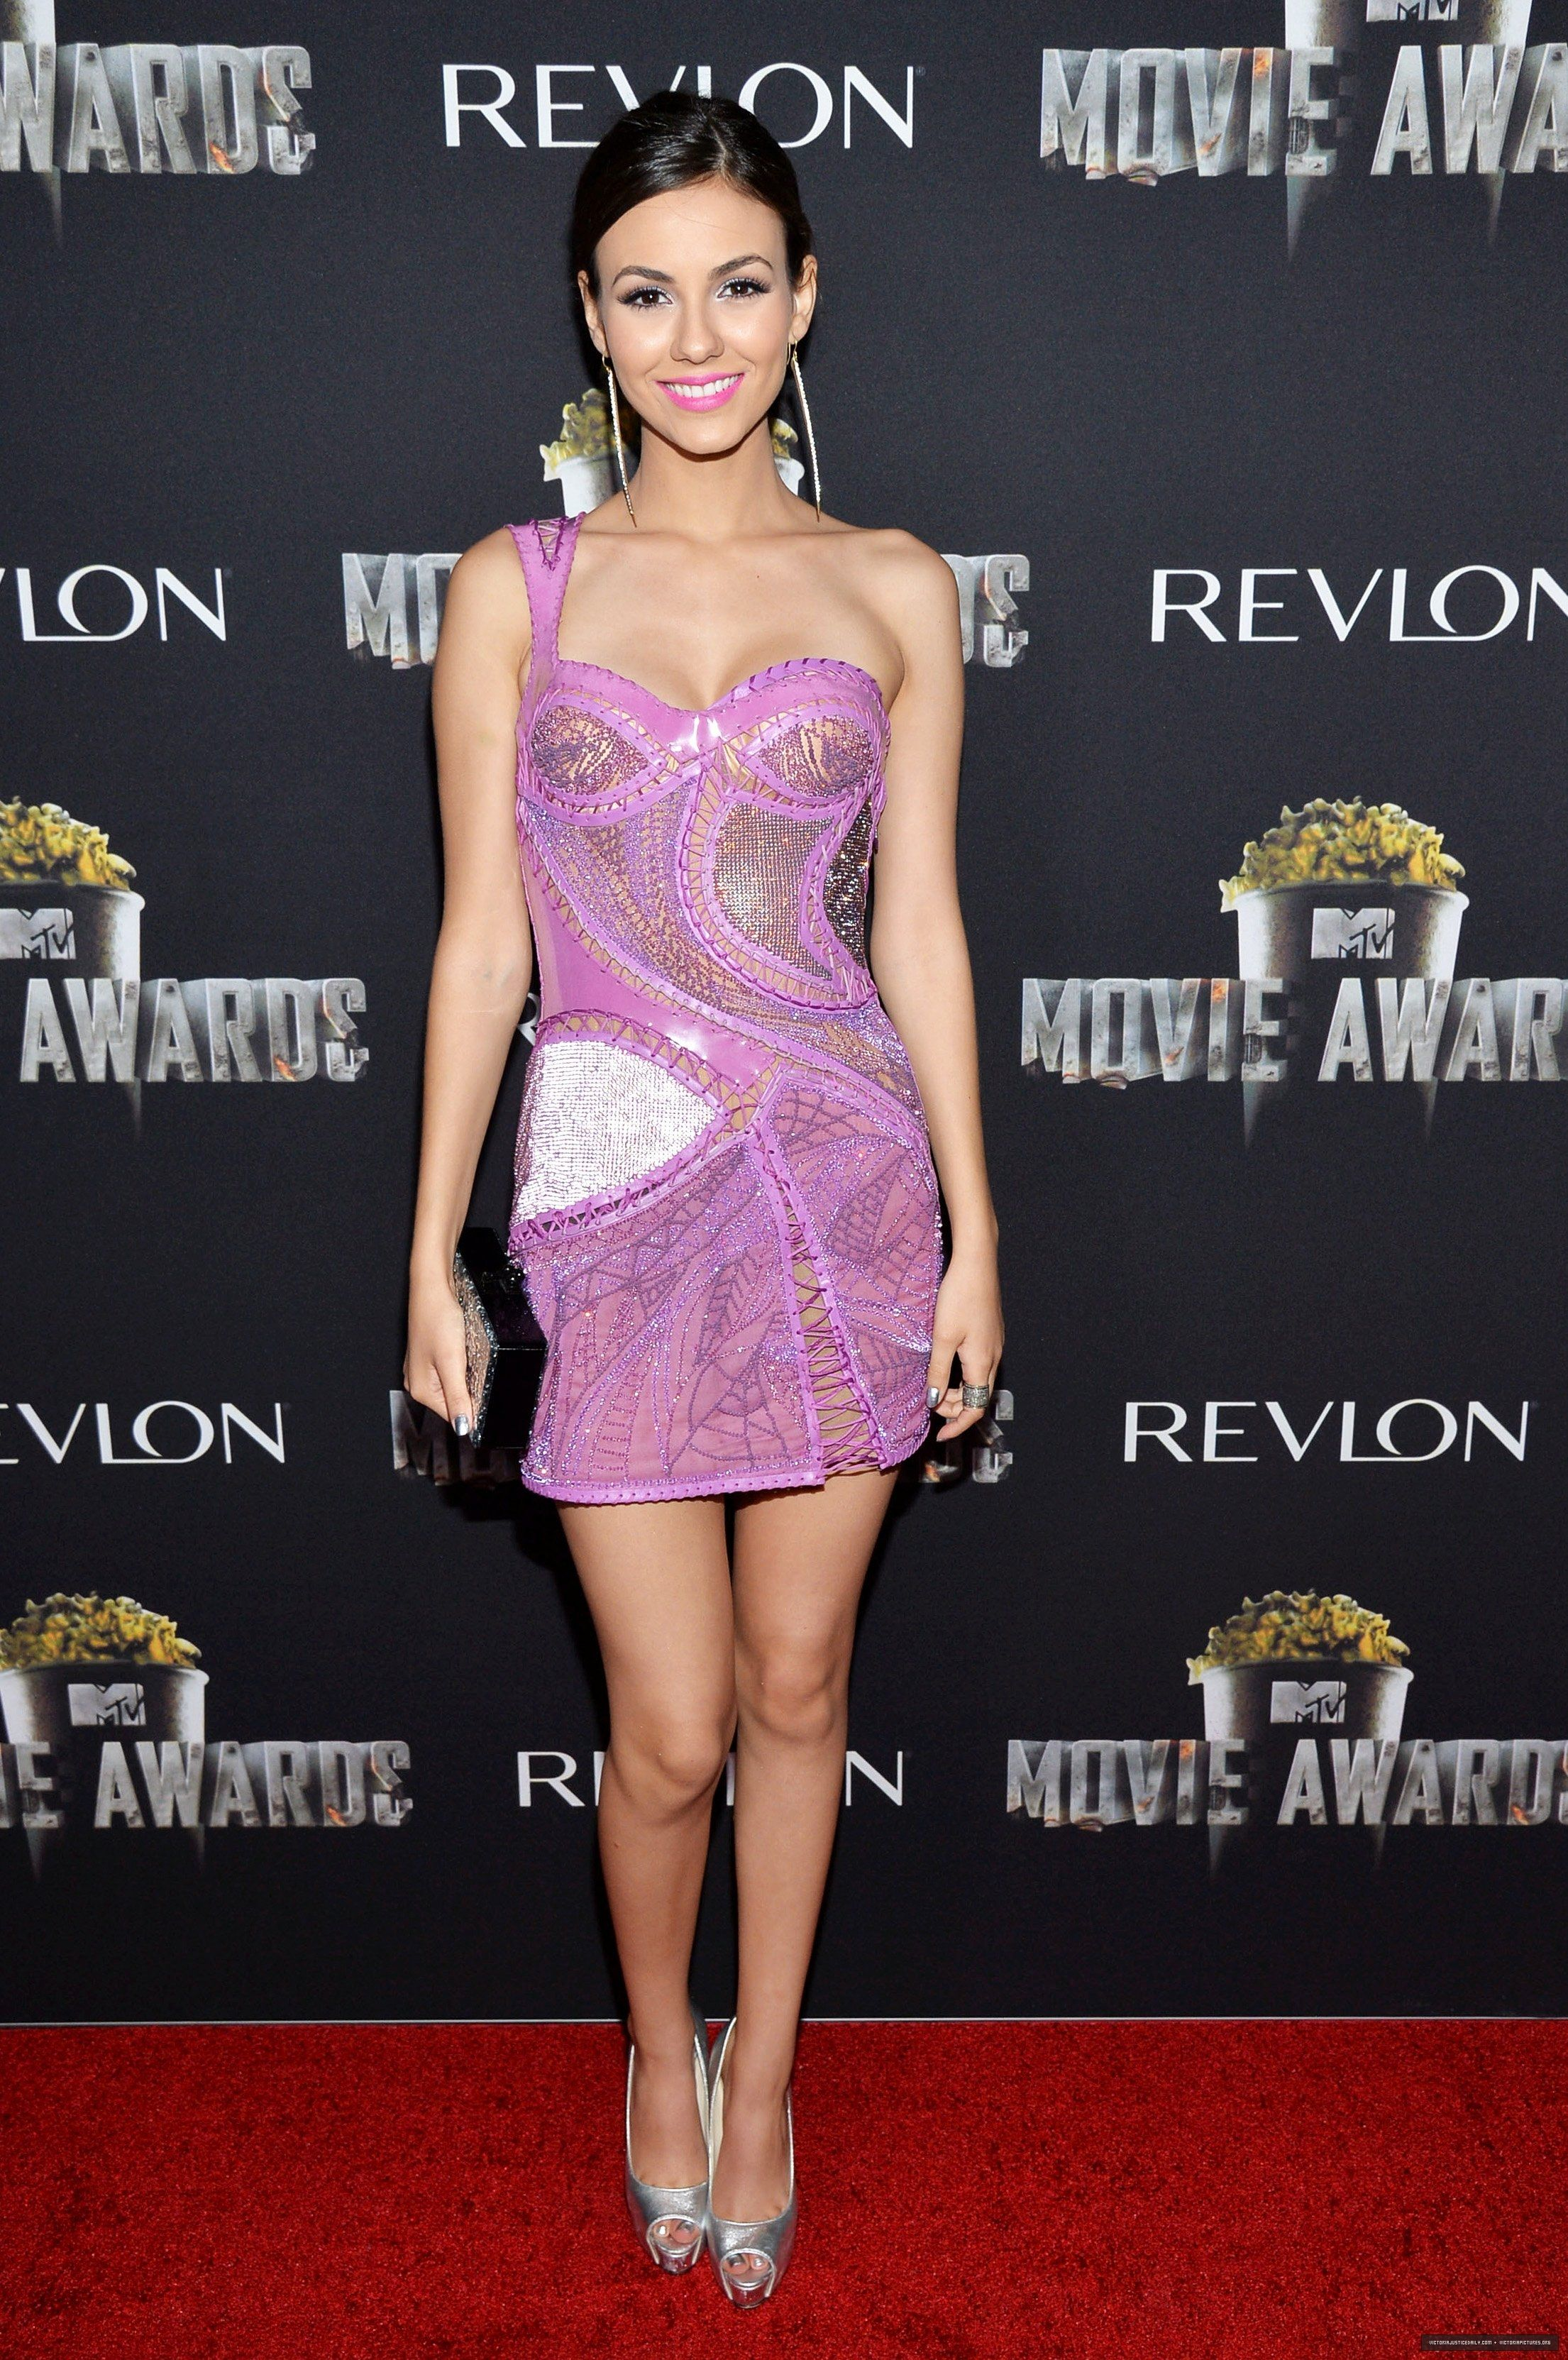 Victoria Justice at the 2014 MTV Movie Awards | Victoria Justice ...